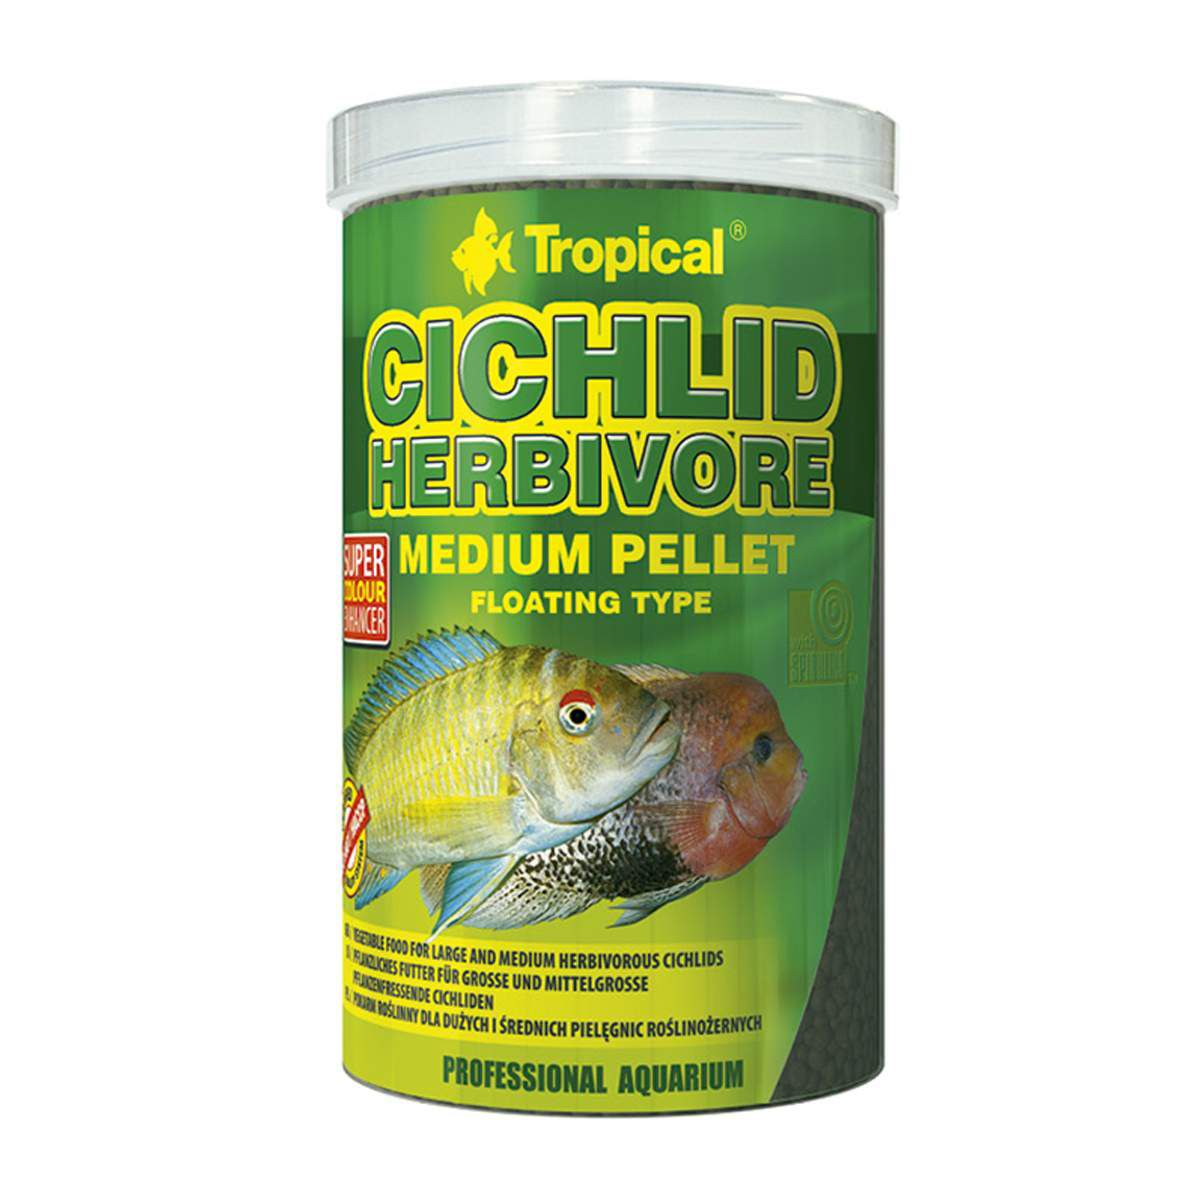 Tropical Cichlid Herbivore Medium Pellet 180g